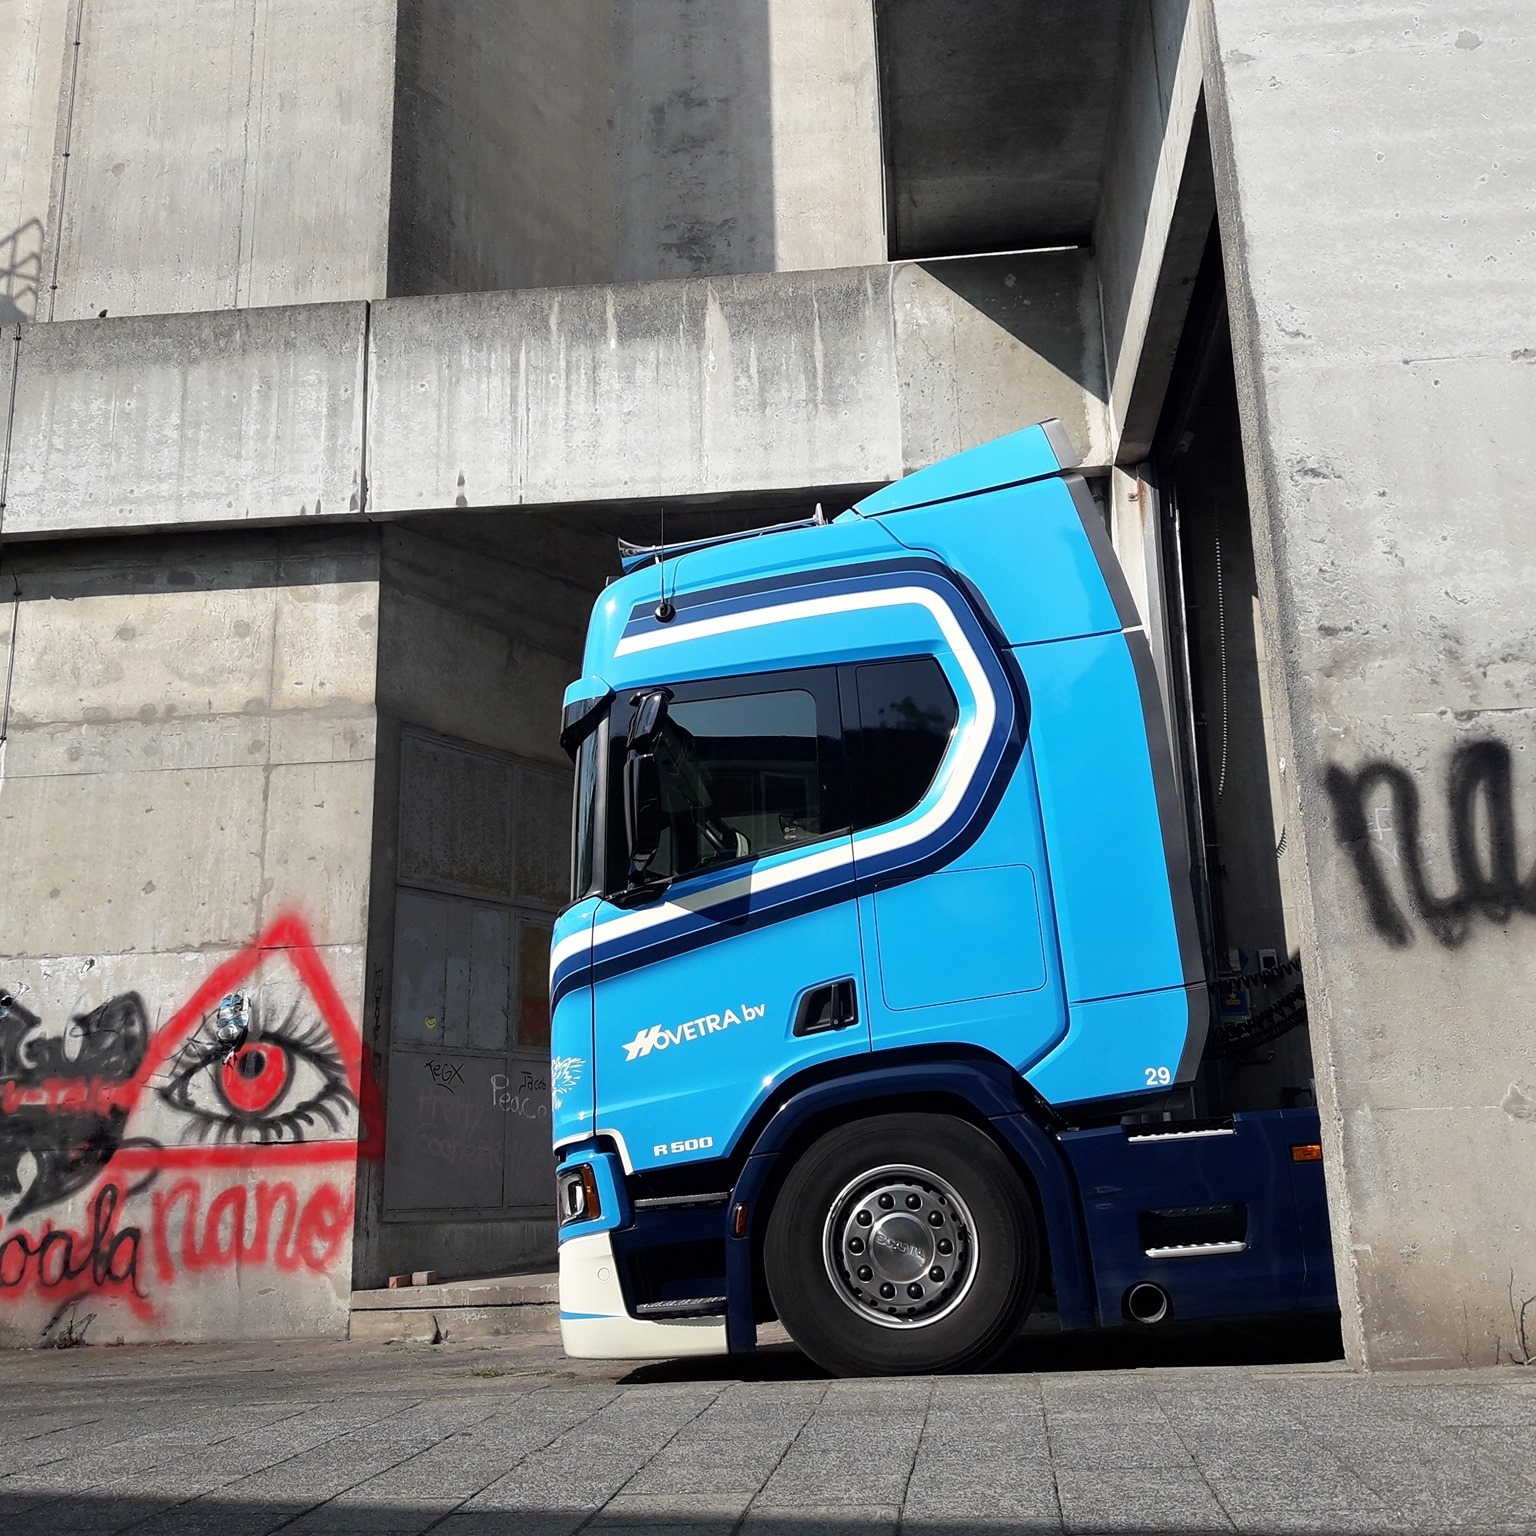 Scania-25-11-2020